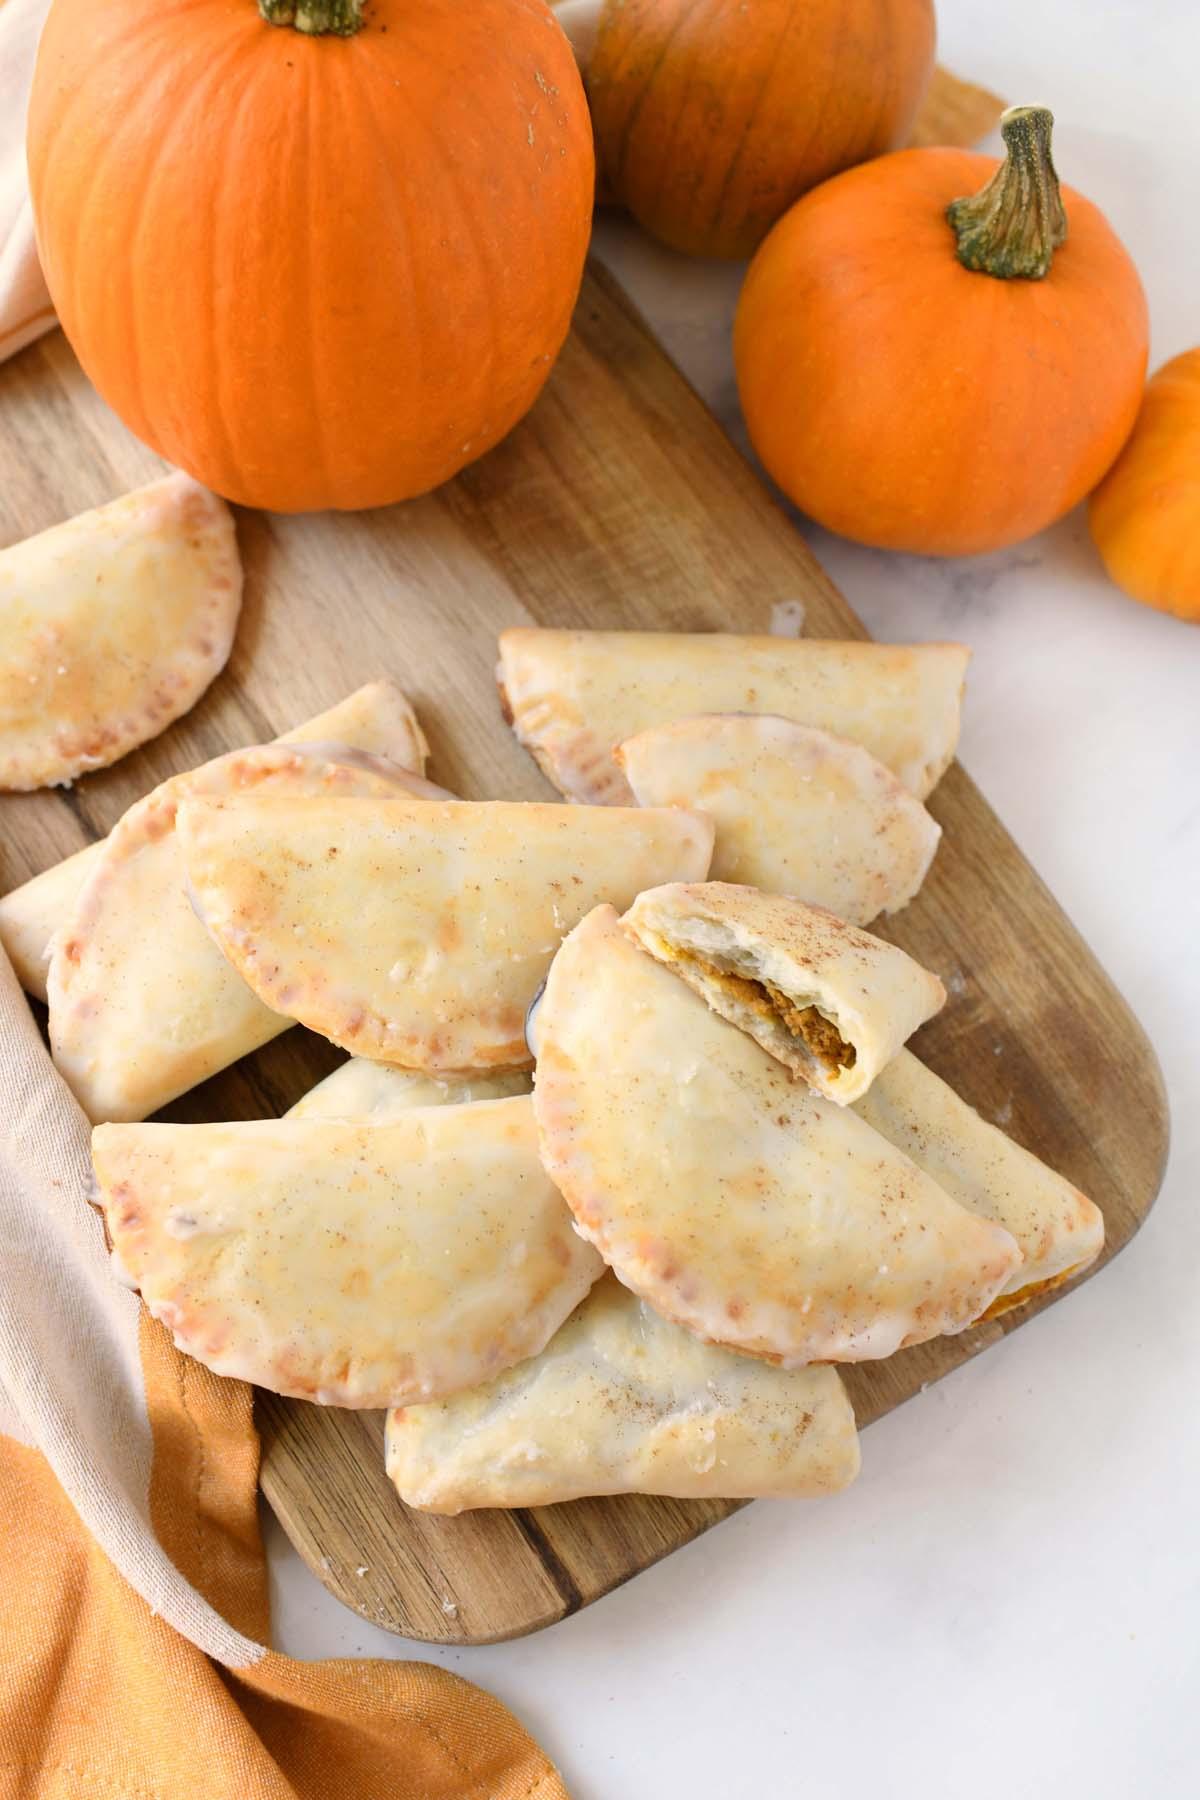 Pumpkin Hand Pies on a wooden board with fresh pumpkins.